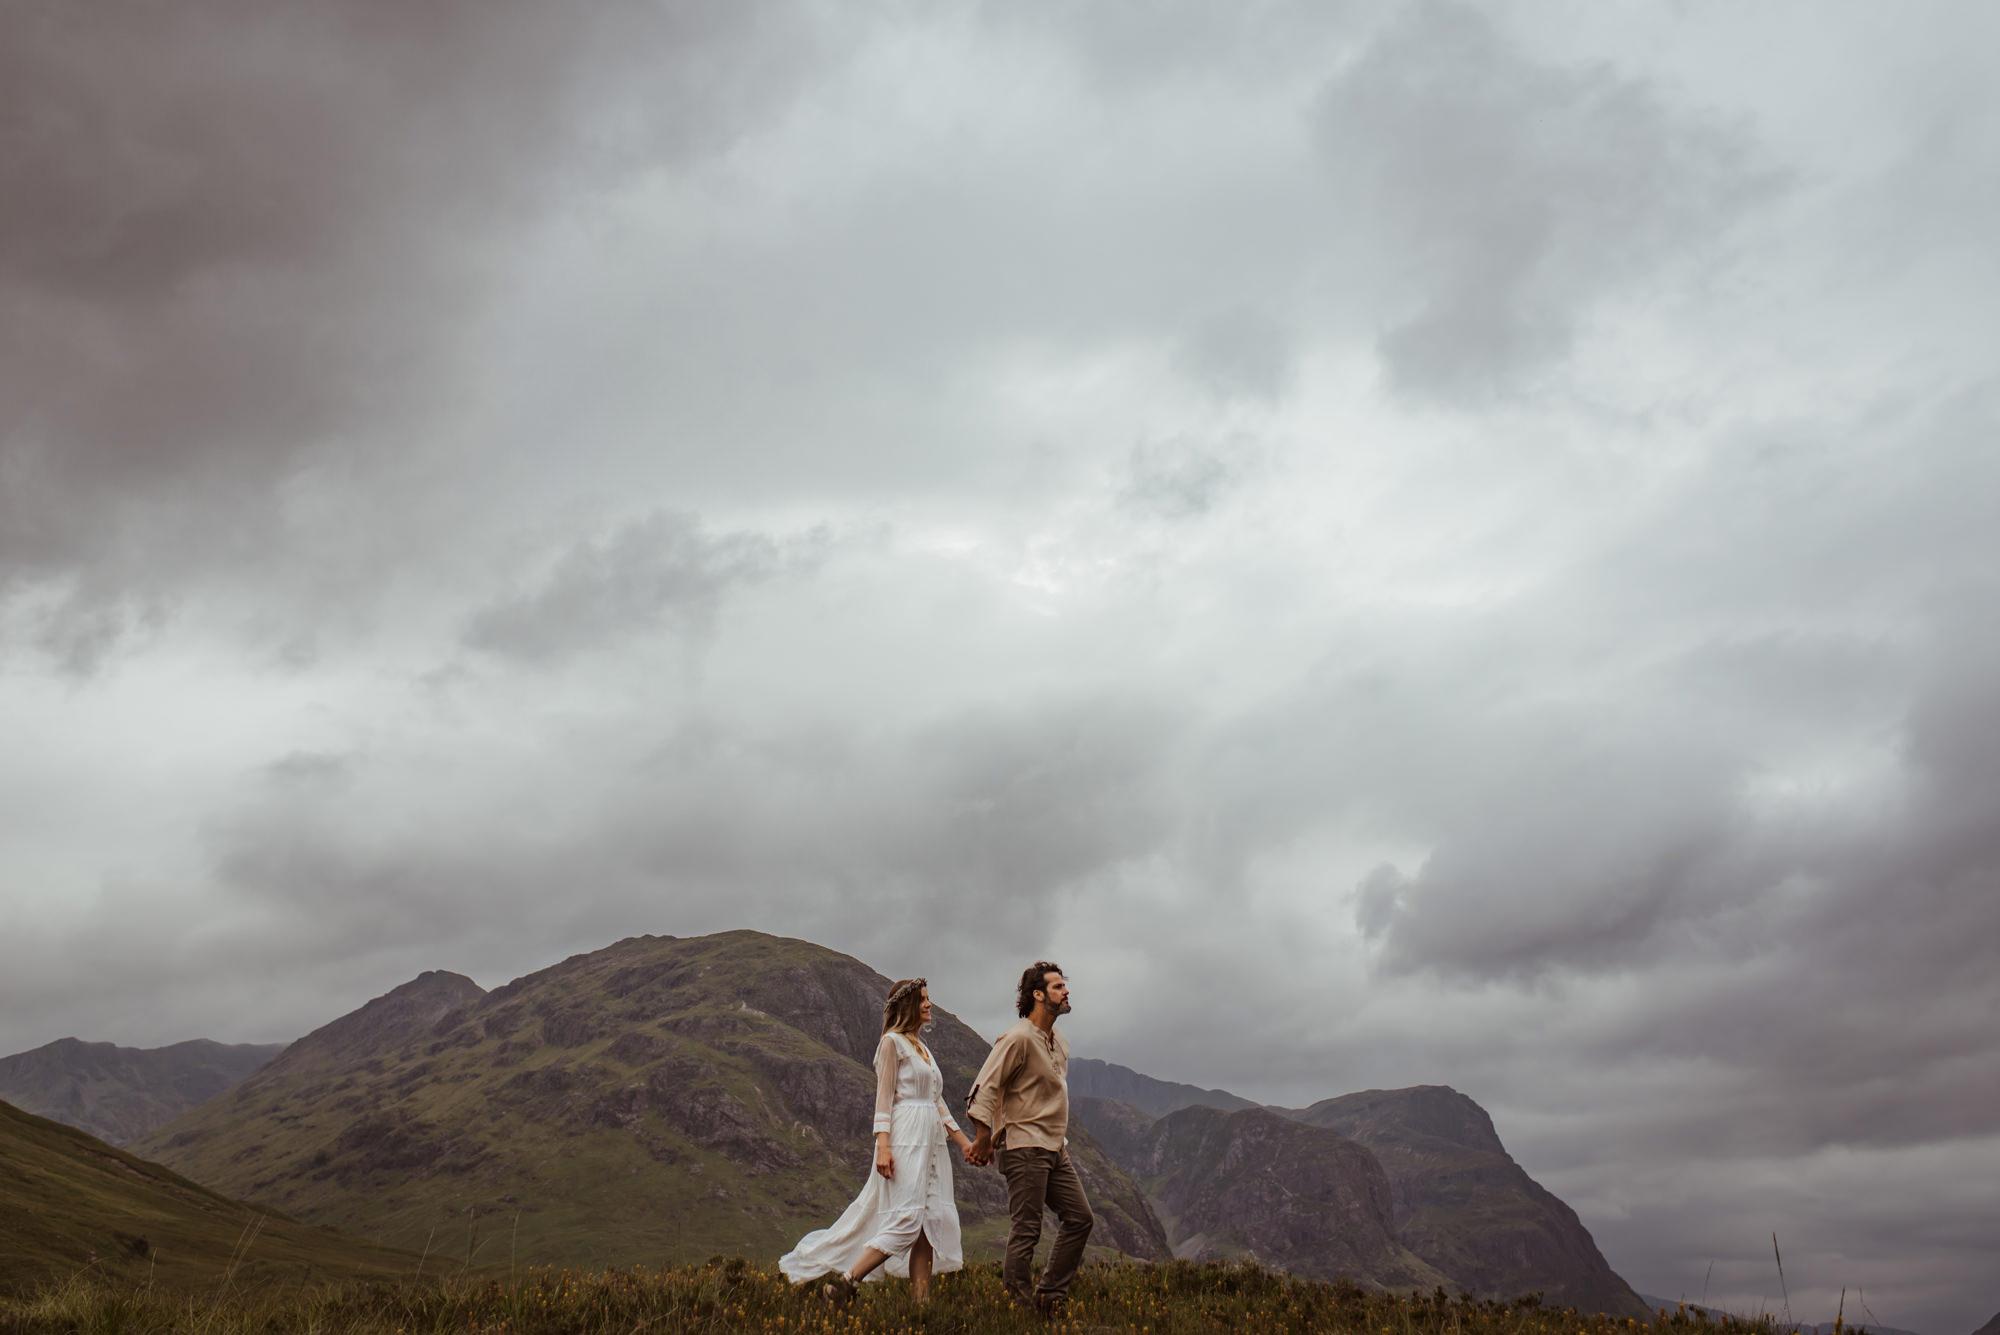 wedding-vow-renewal-scotland-highlands.jpg